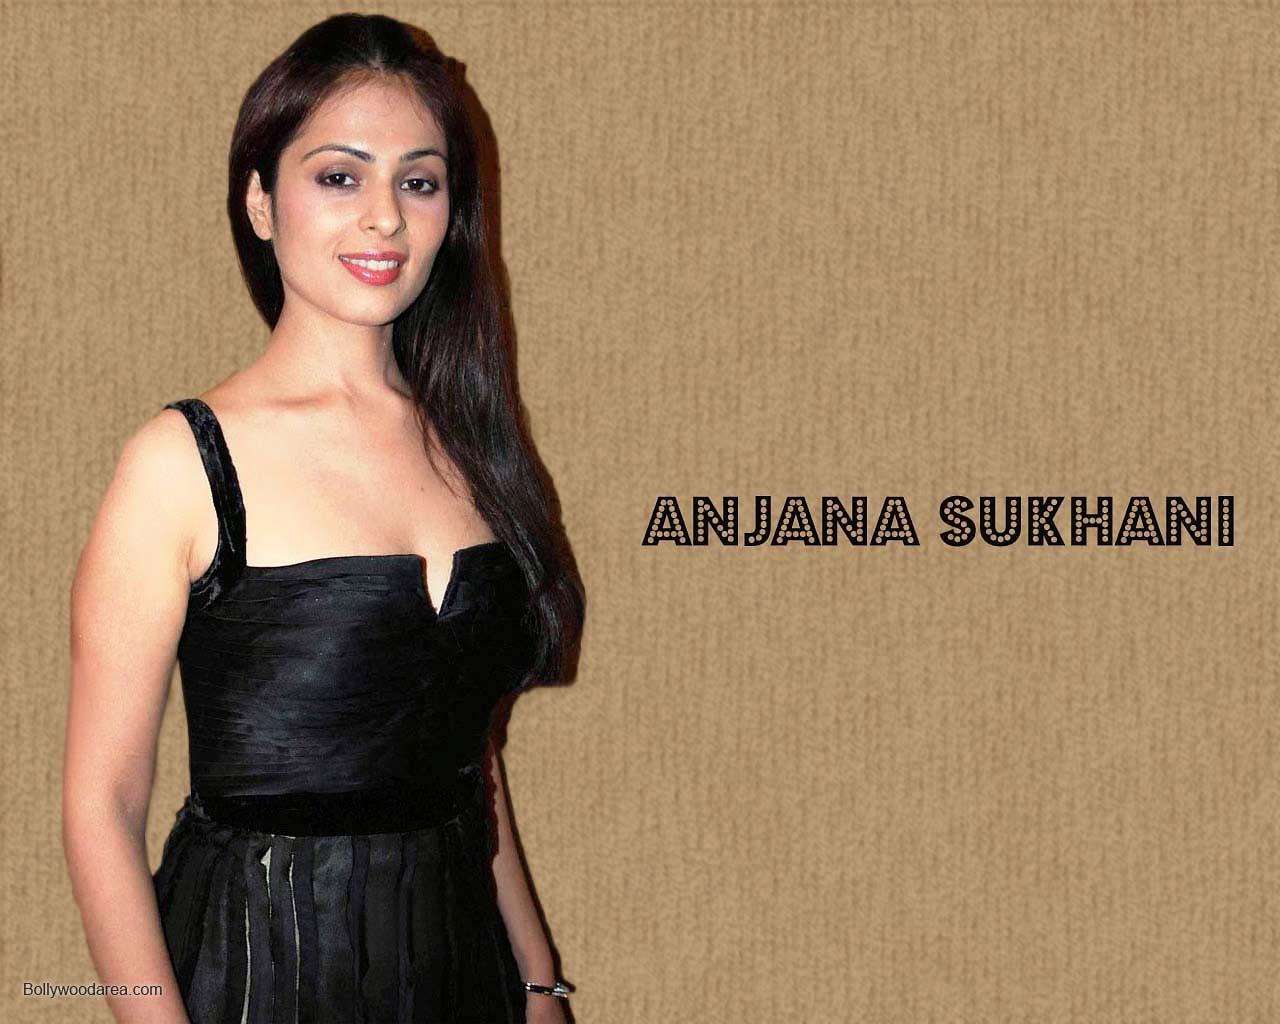 Nangi Indian Actress Sexy Wallpaper - Bolly Actress Pictures-1146